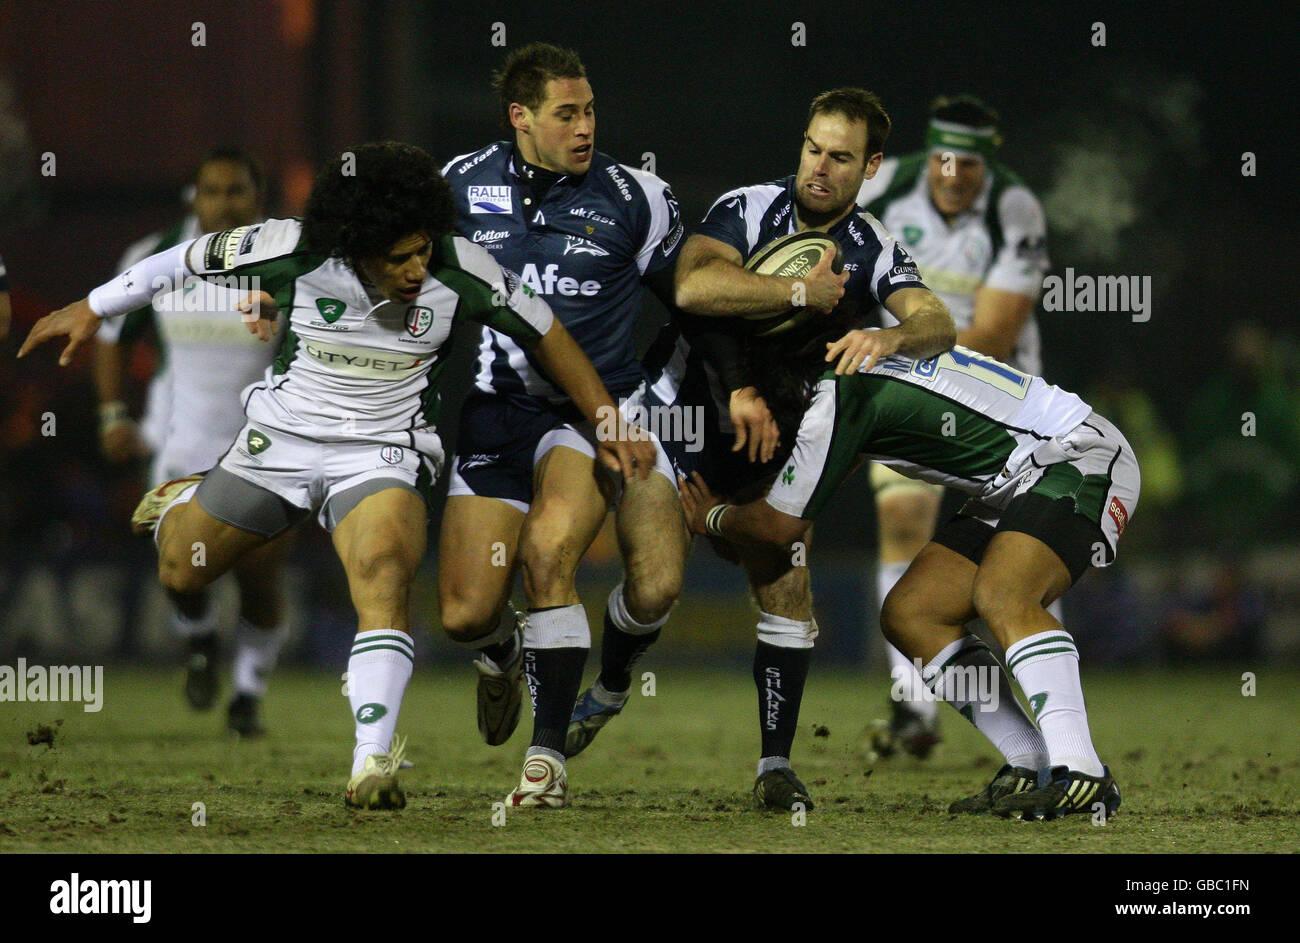 58de0796d4a Rugby Union - Guinness Premiership - Sale Sharks v London Irish - Edgeley  Park